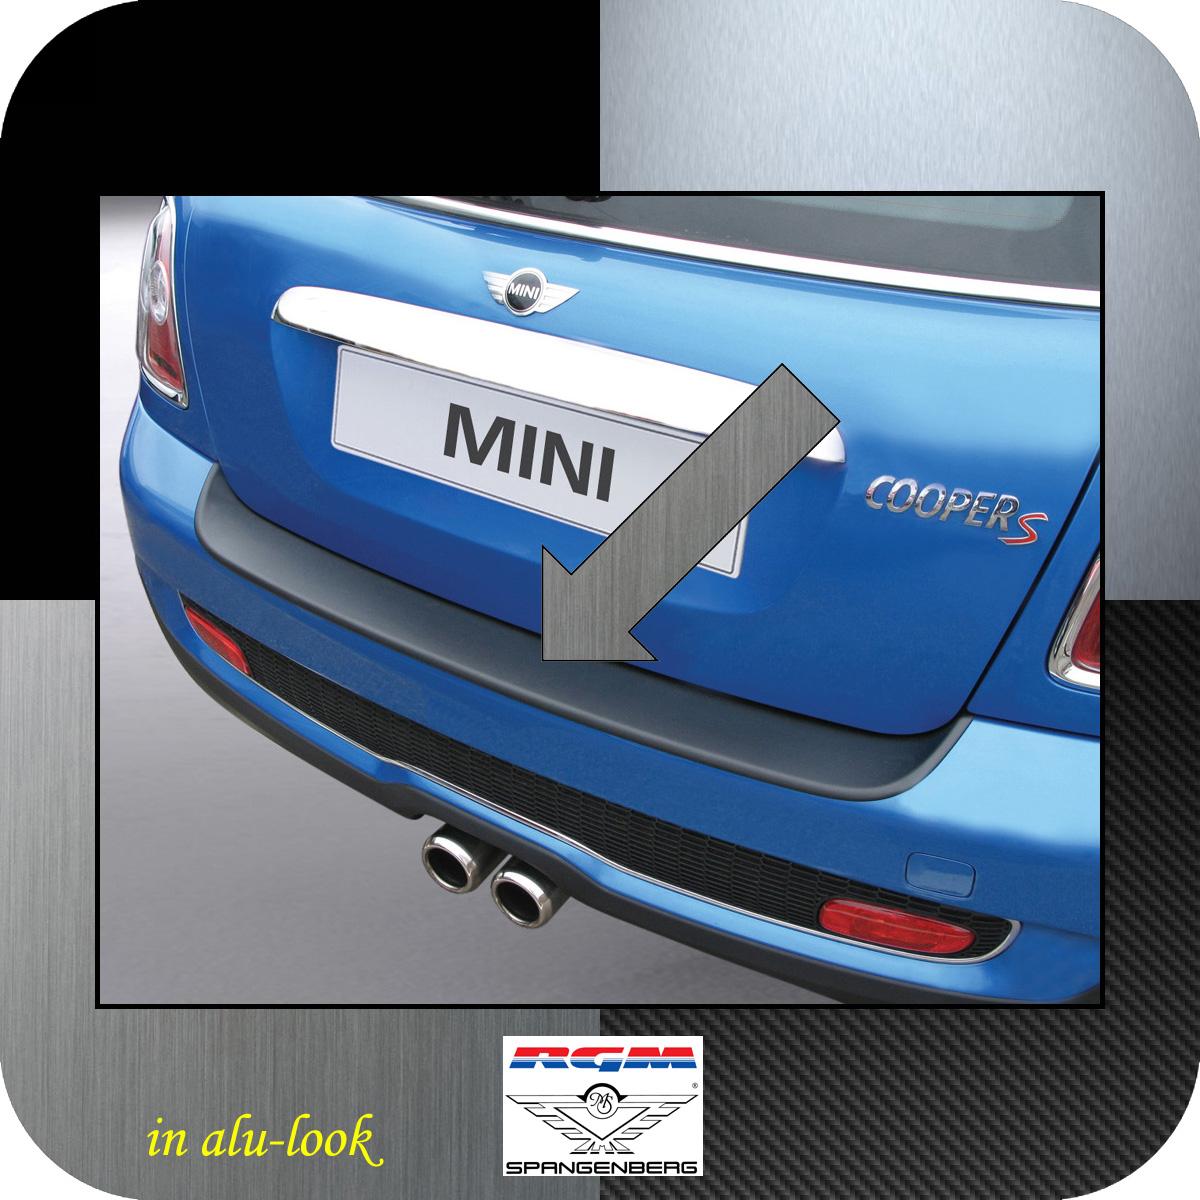 Ladekantenschutz Alu-Look Mini BMW Coupe Cooper R58 ab Baujahr 2011- 3504102